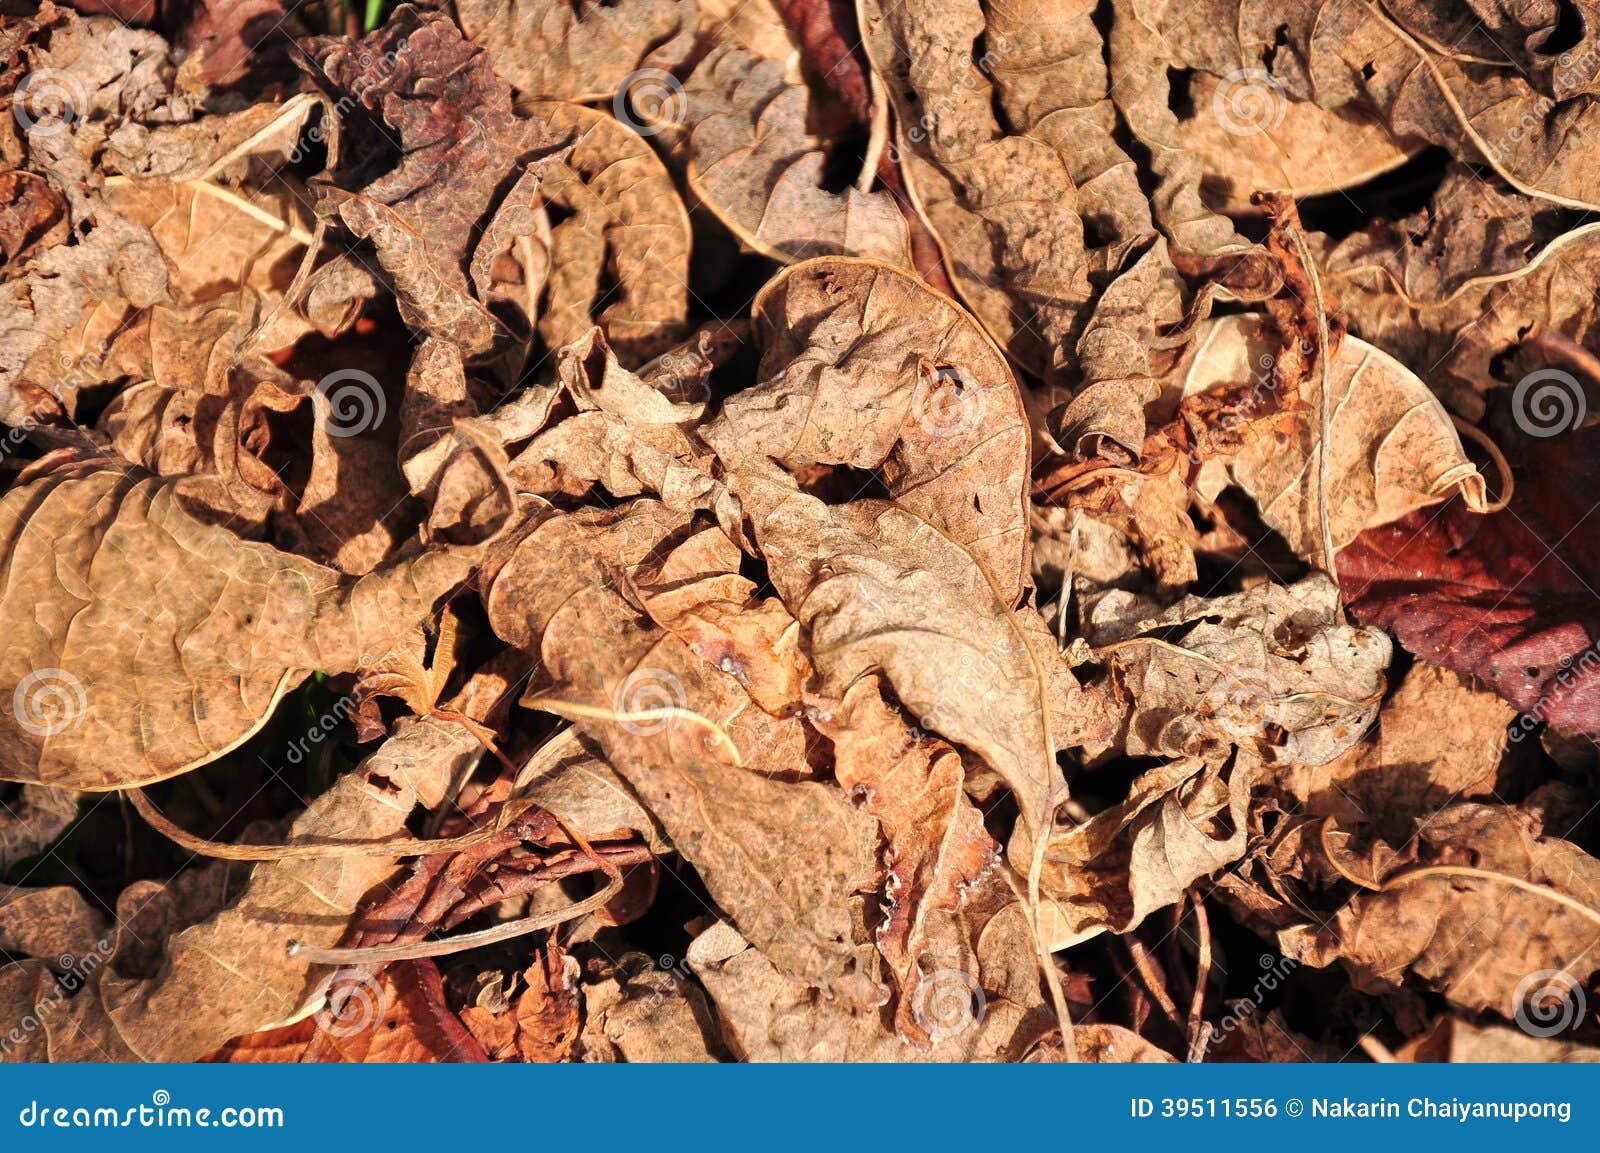 Lot of dry leaves